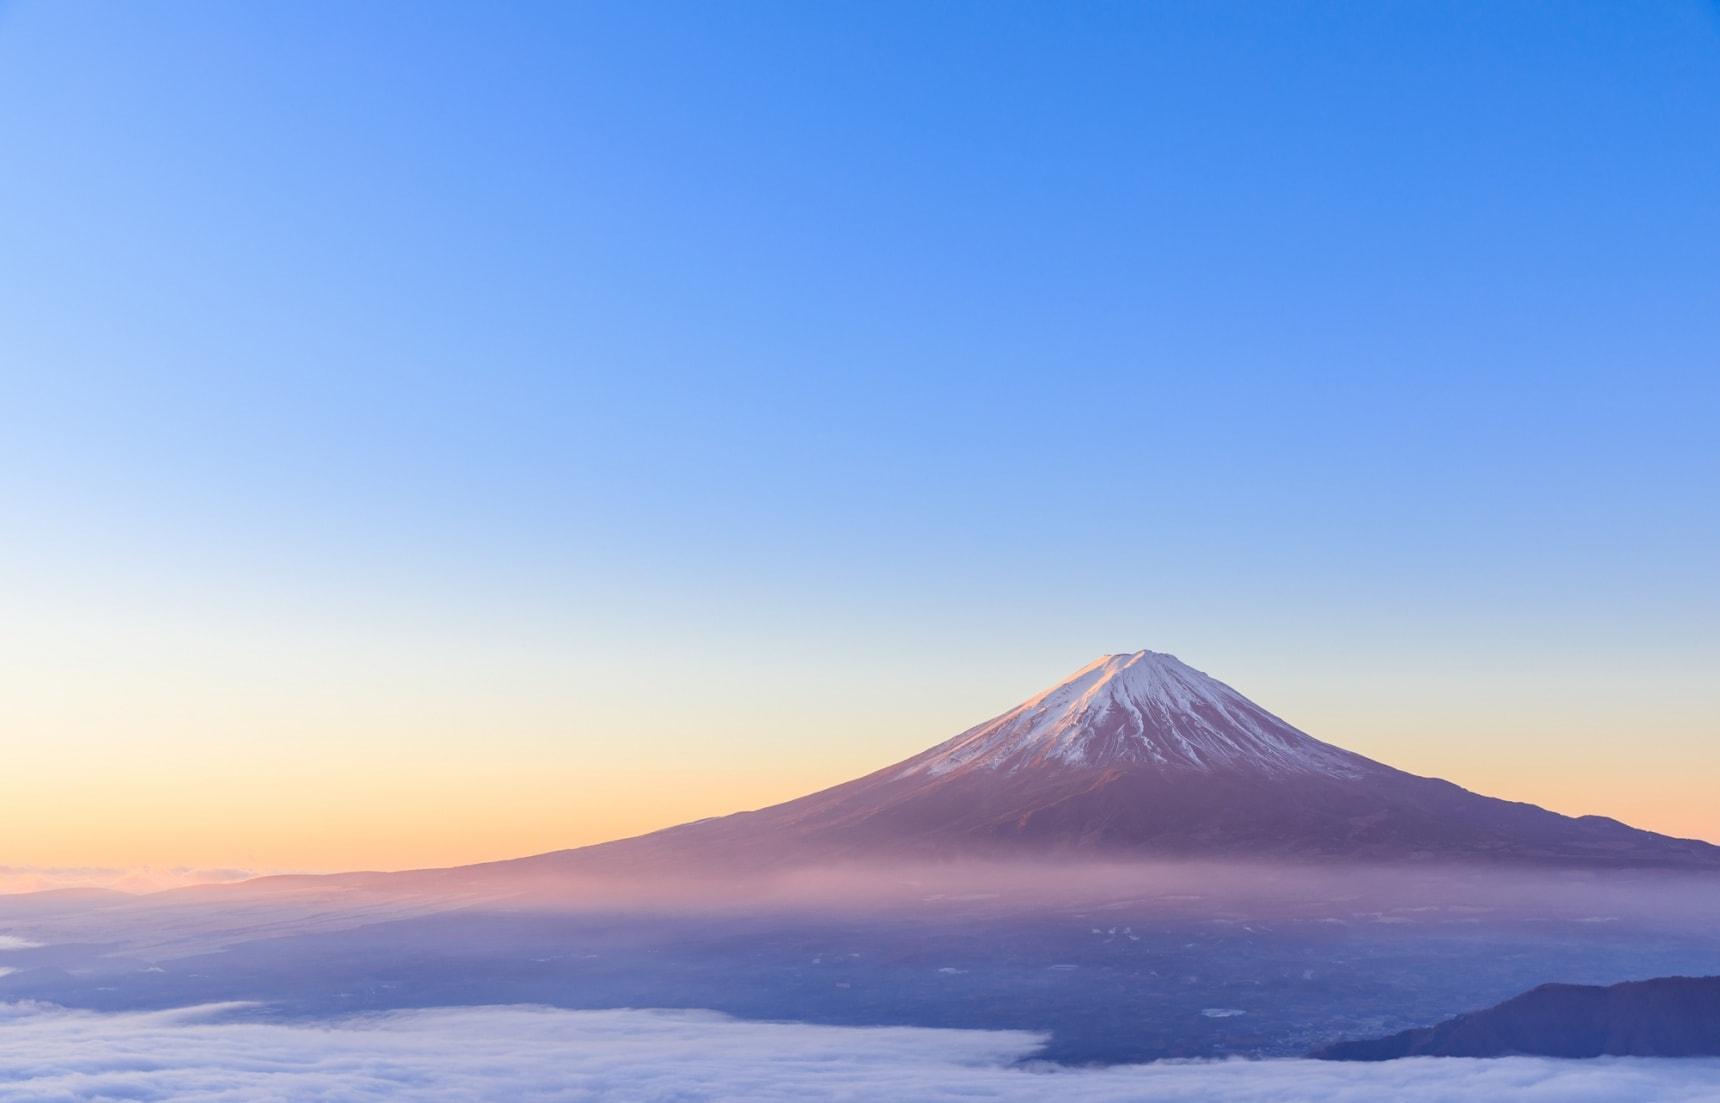 Explore Japan with Virtual Tours